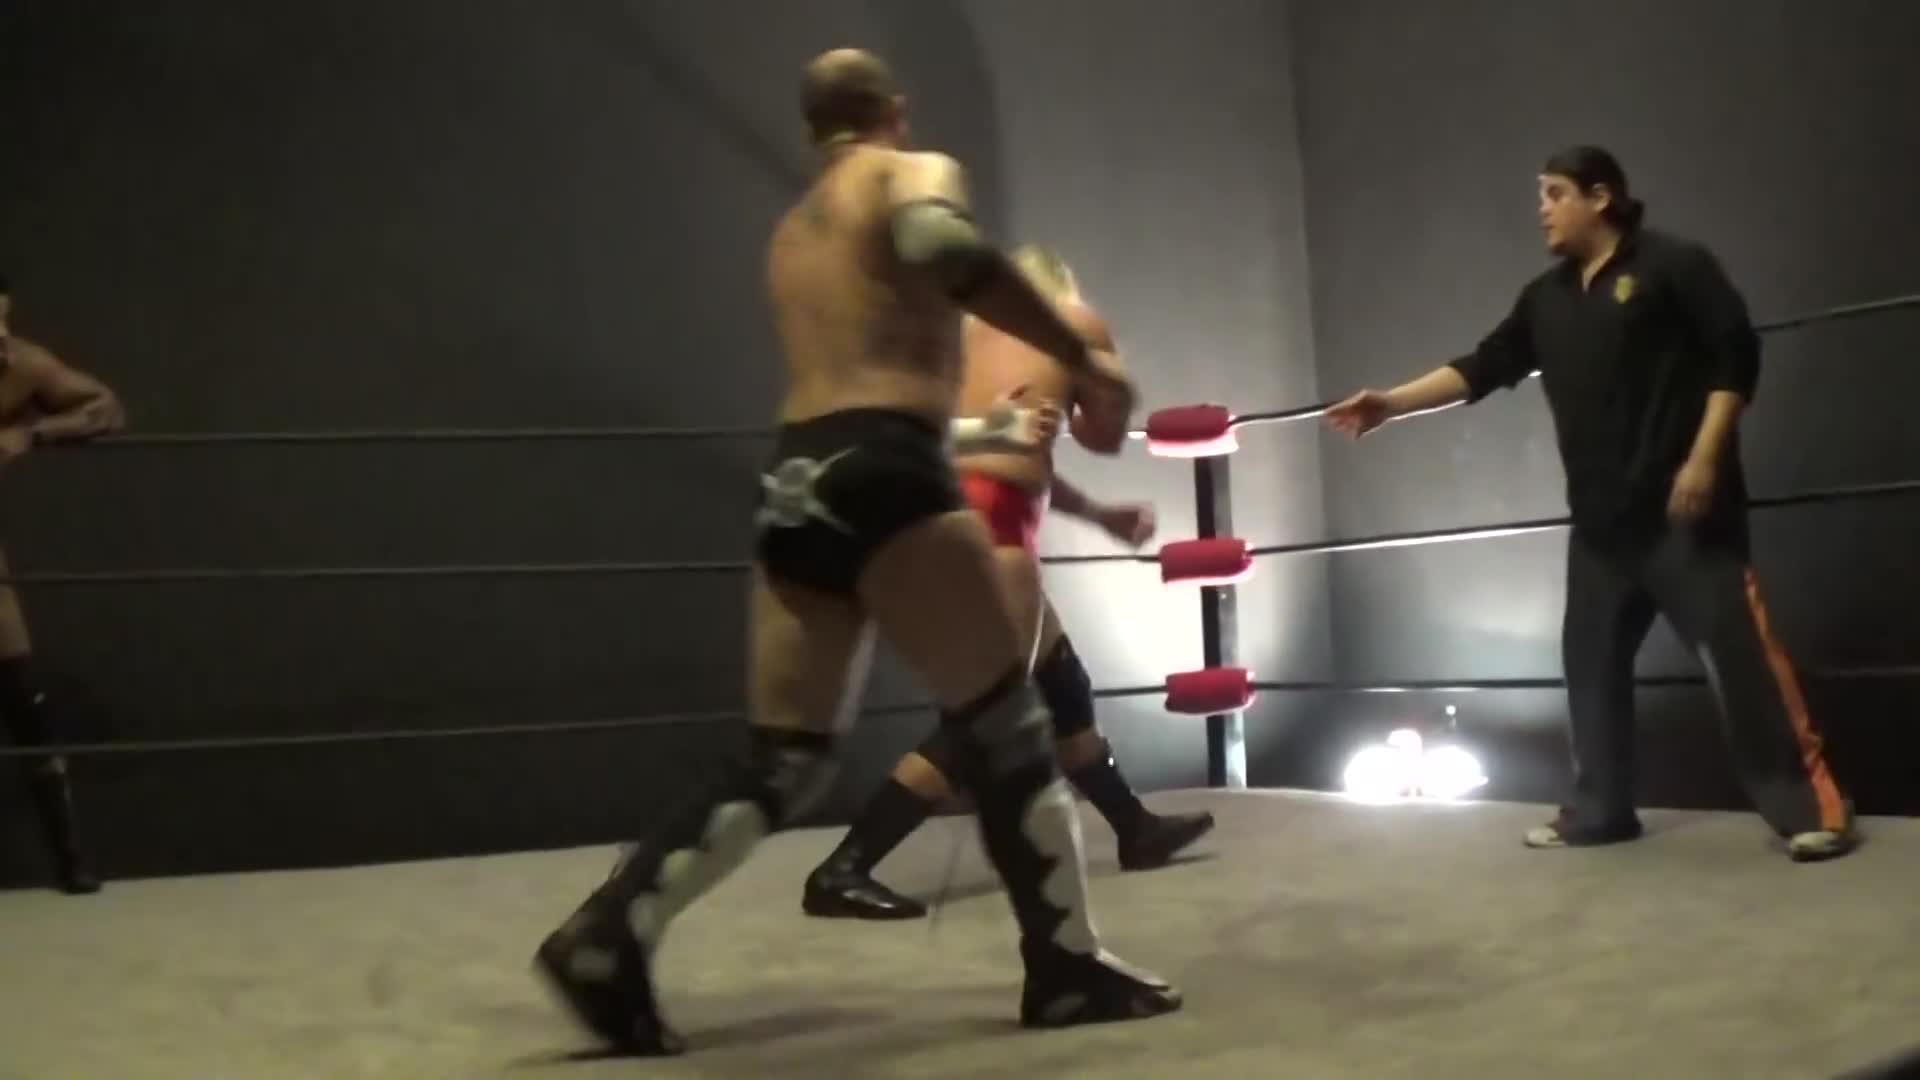 Comedy, Ricardo Rodriguez, wrestling, Arm drag GIFs